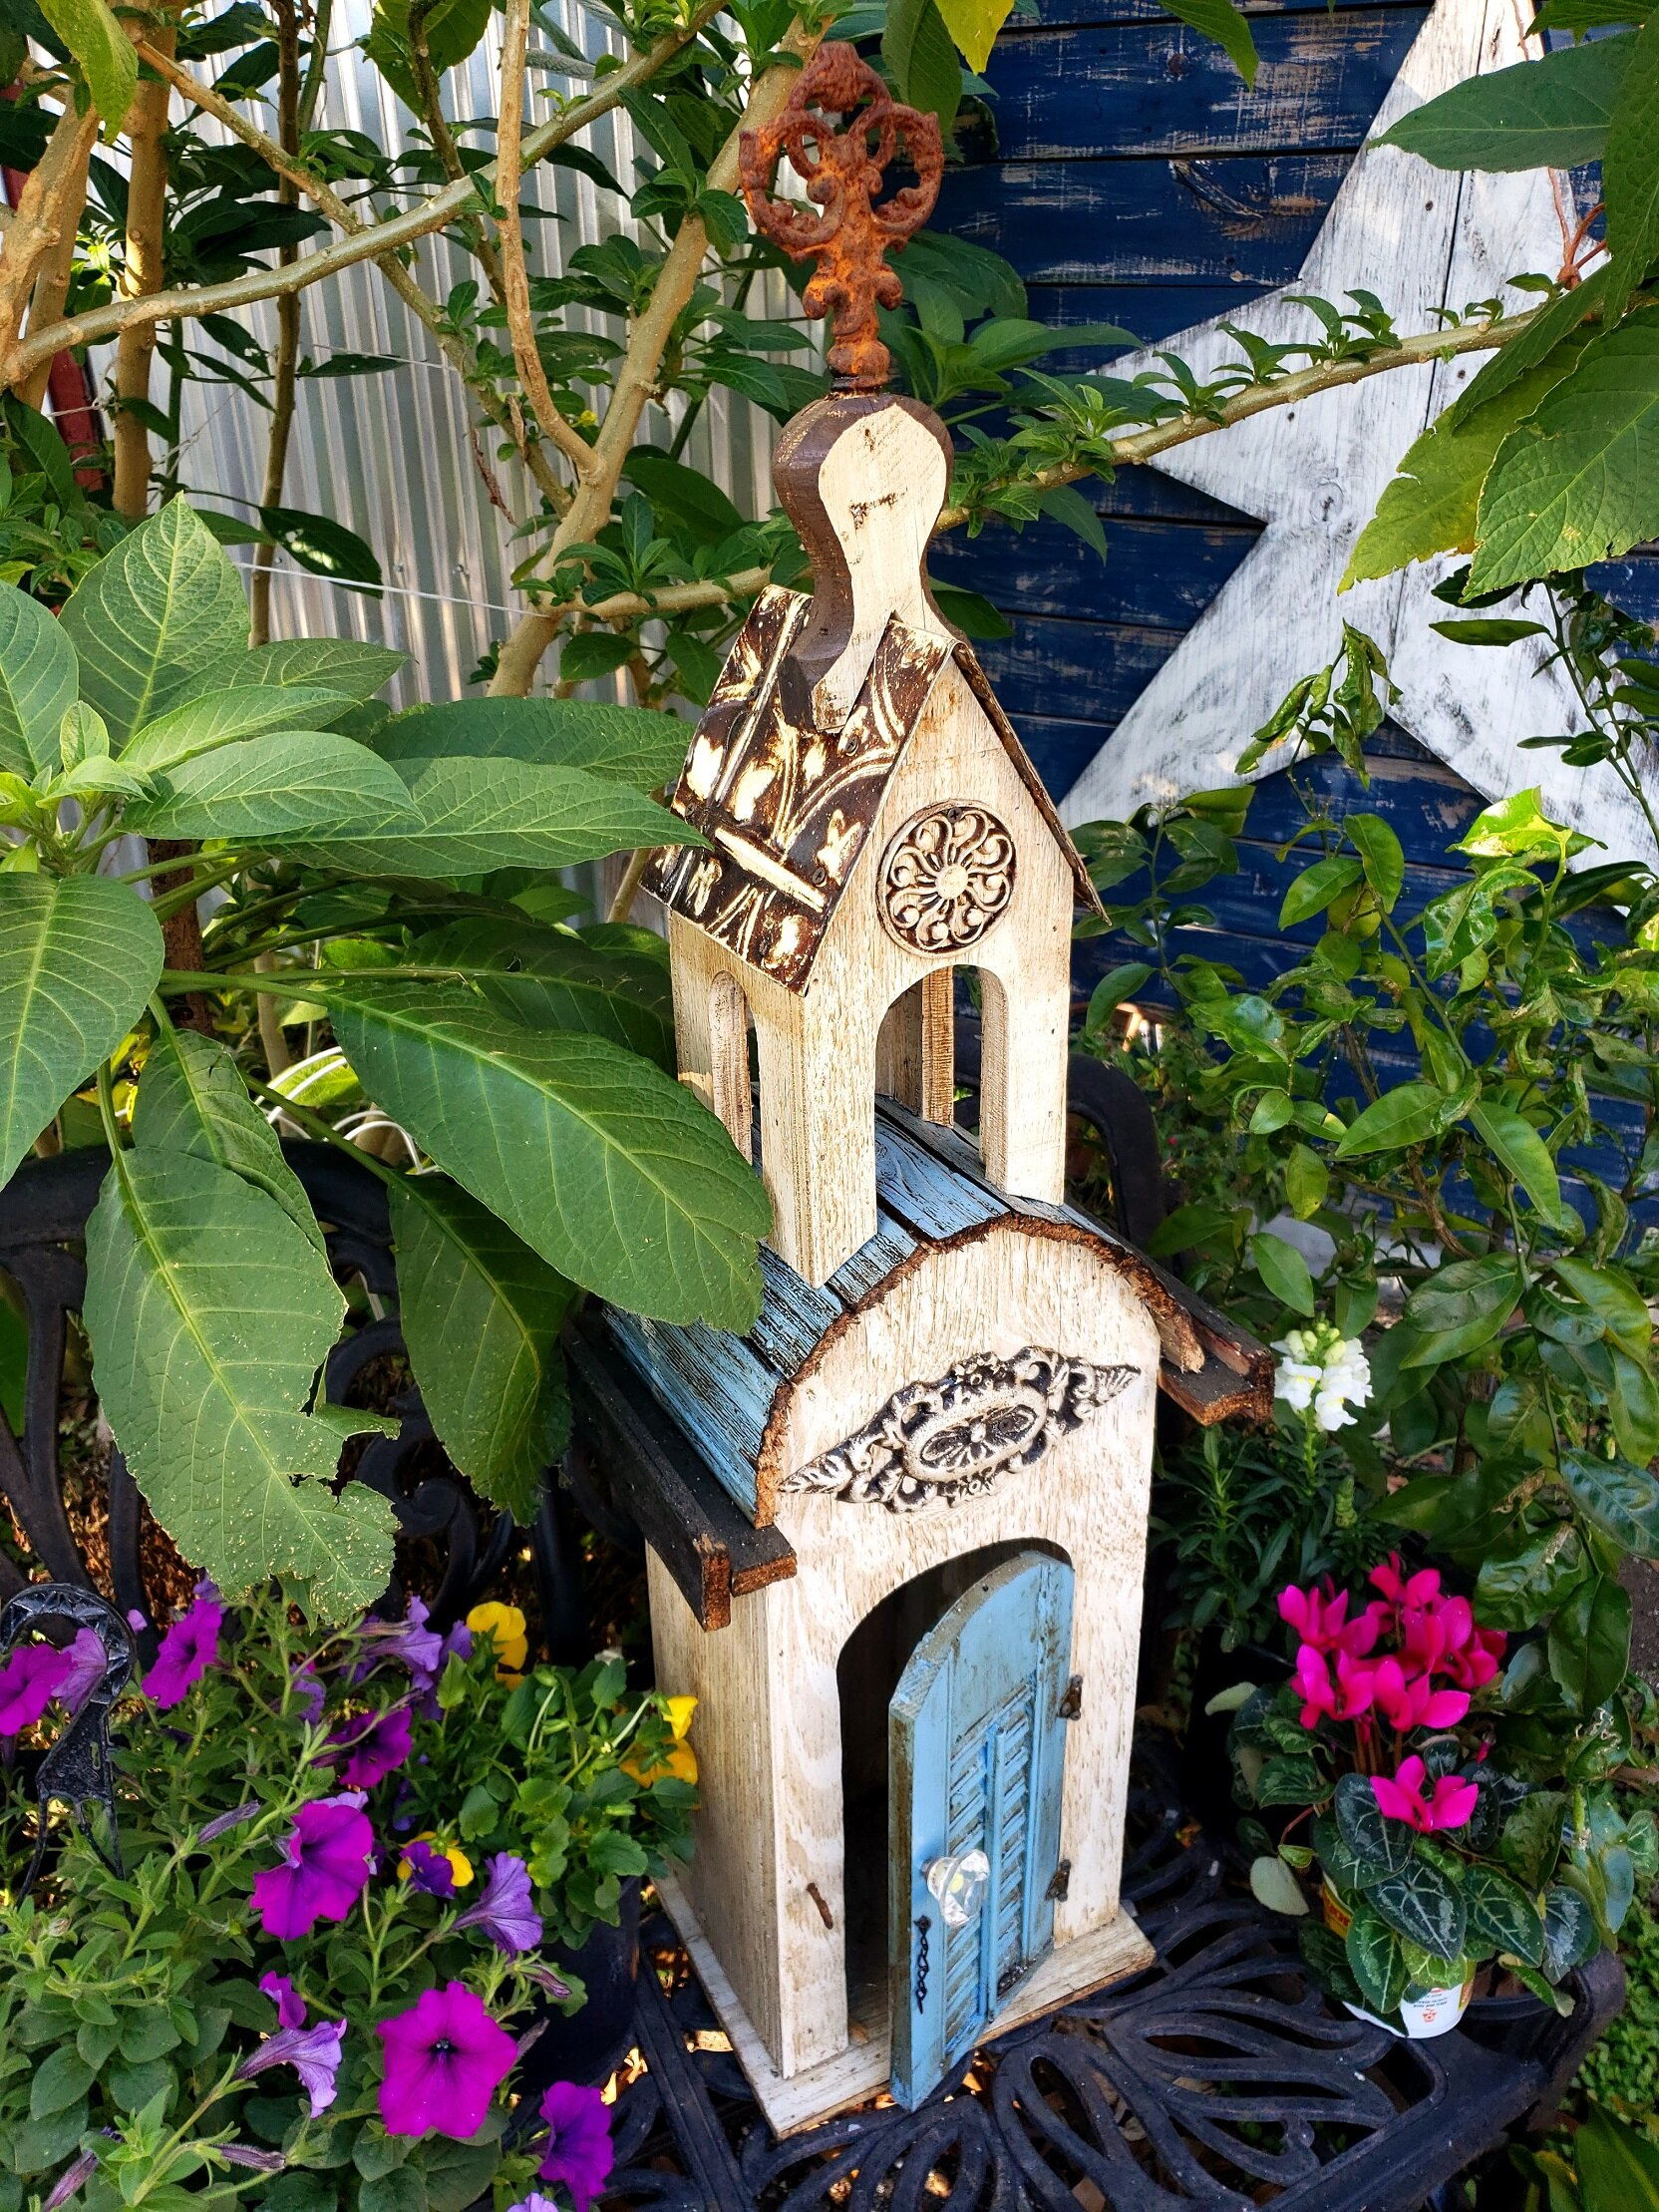 Lorenzos Woodworks Bird Houses You Ll Love In 2021 Wayfair